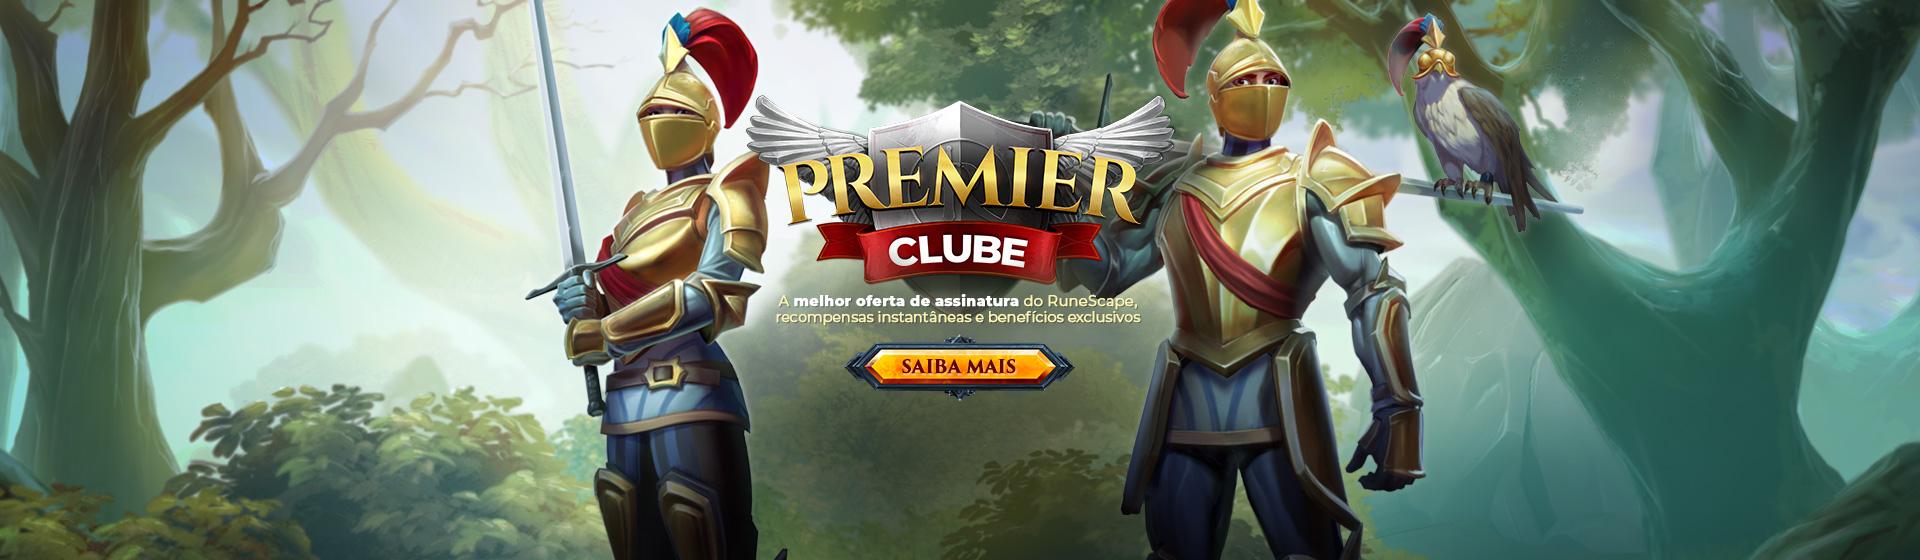 Premier Clube 2020